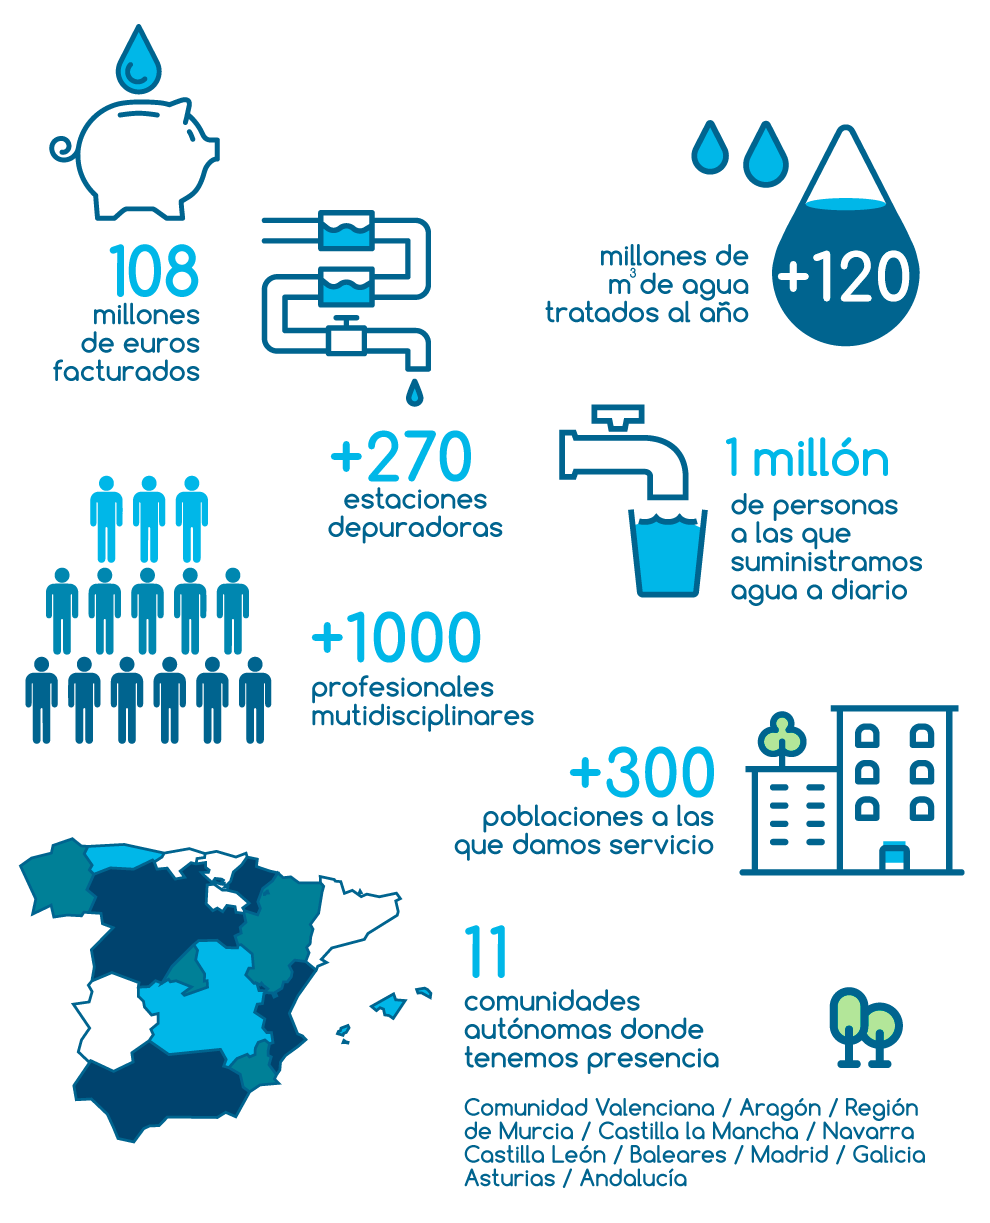 infografias_web_cifras_azul2020b.png